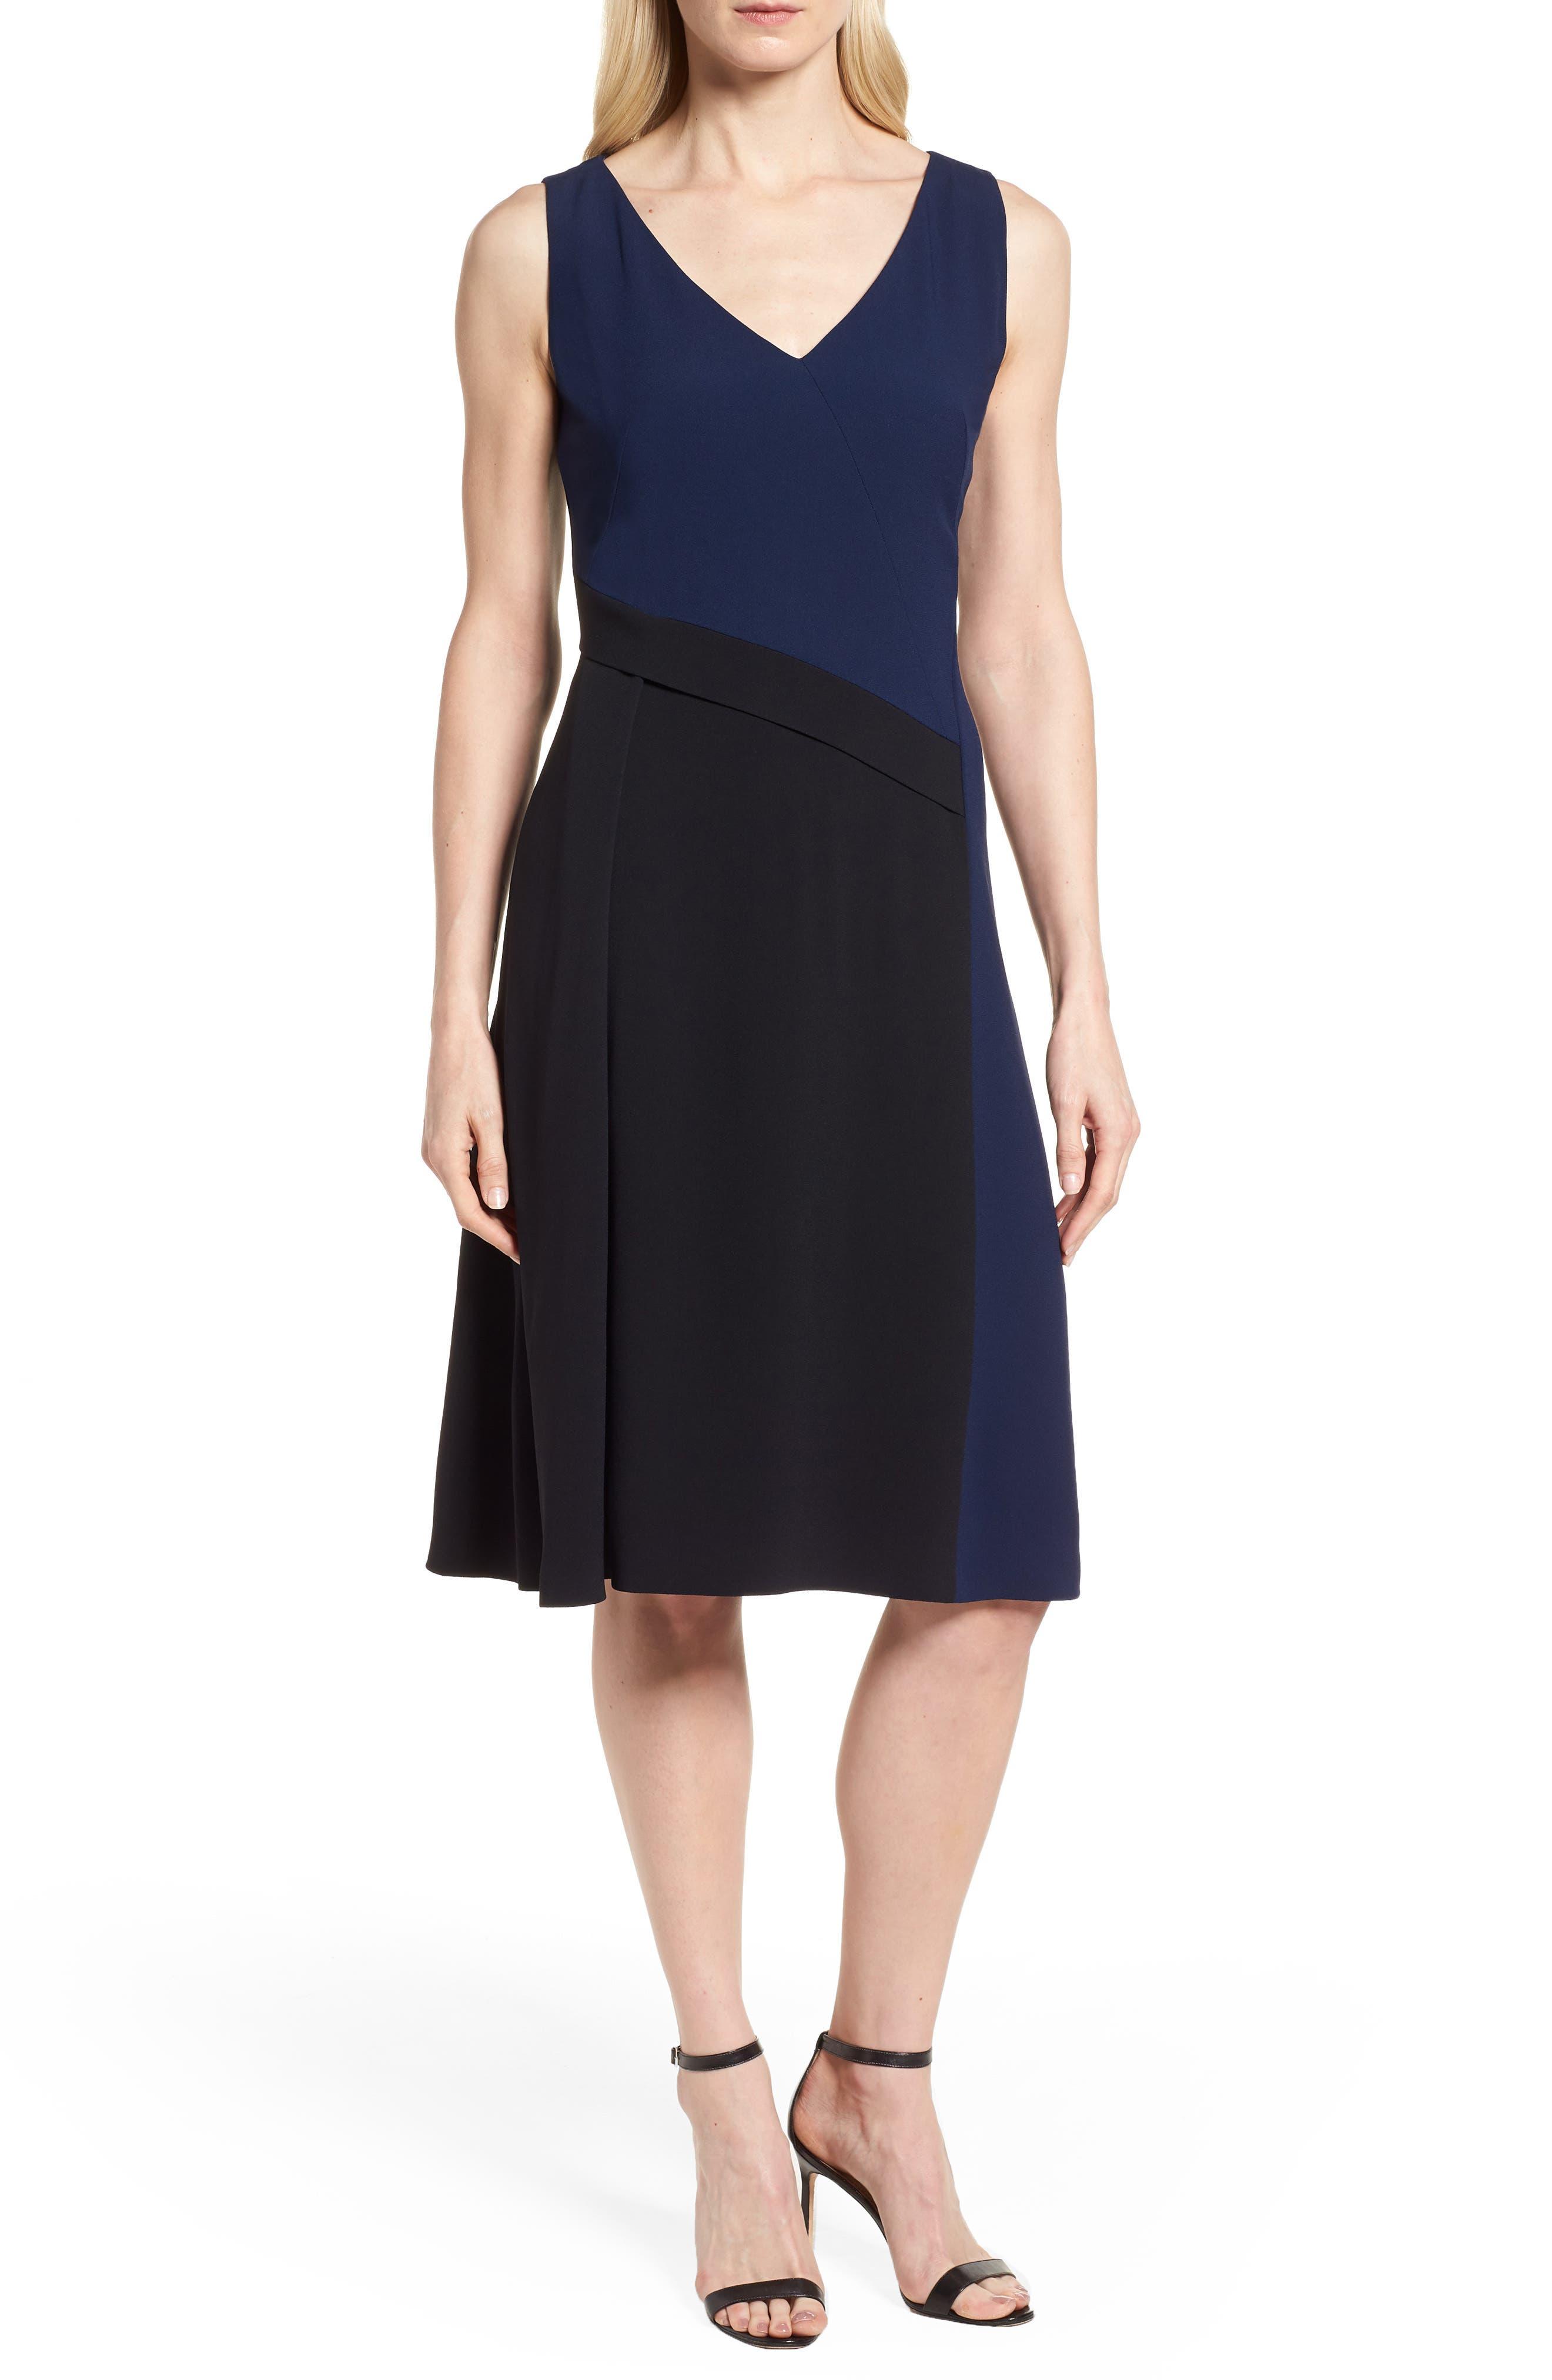 Demana A-Line Dress,                             Main thumbnail 1, color,                             Black